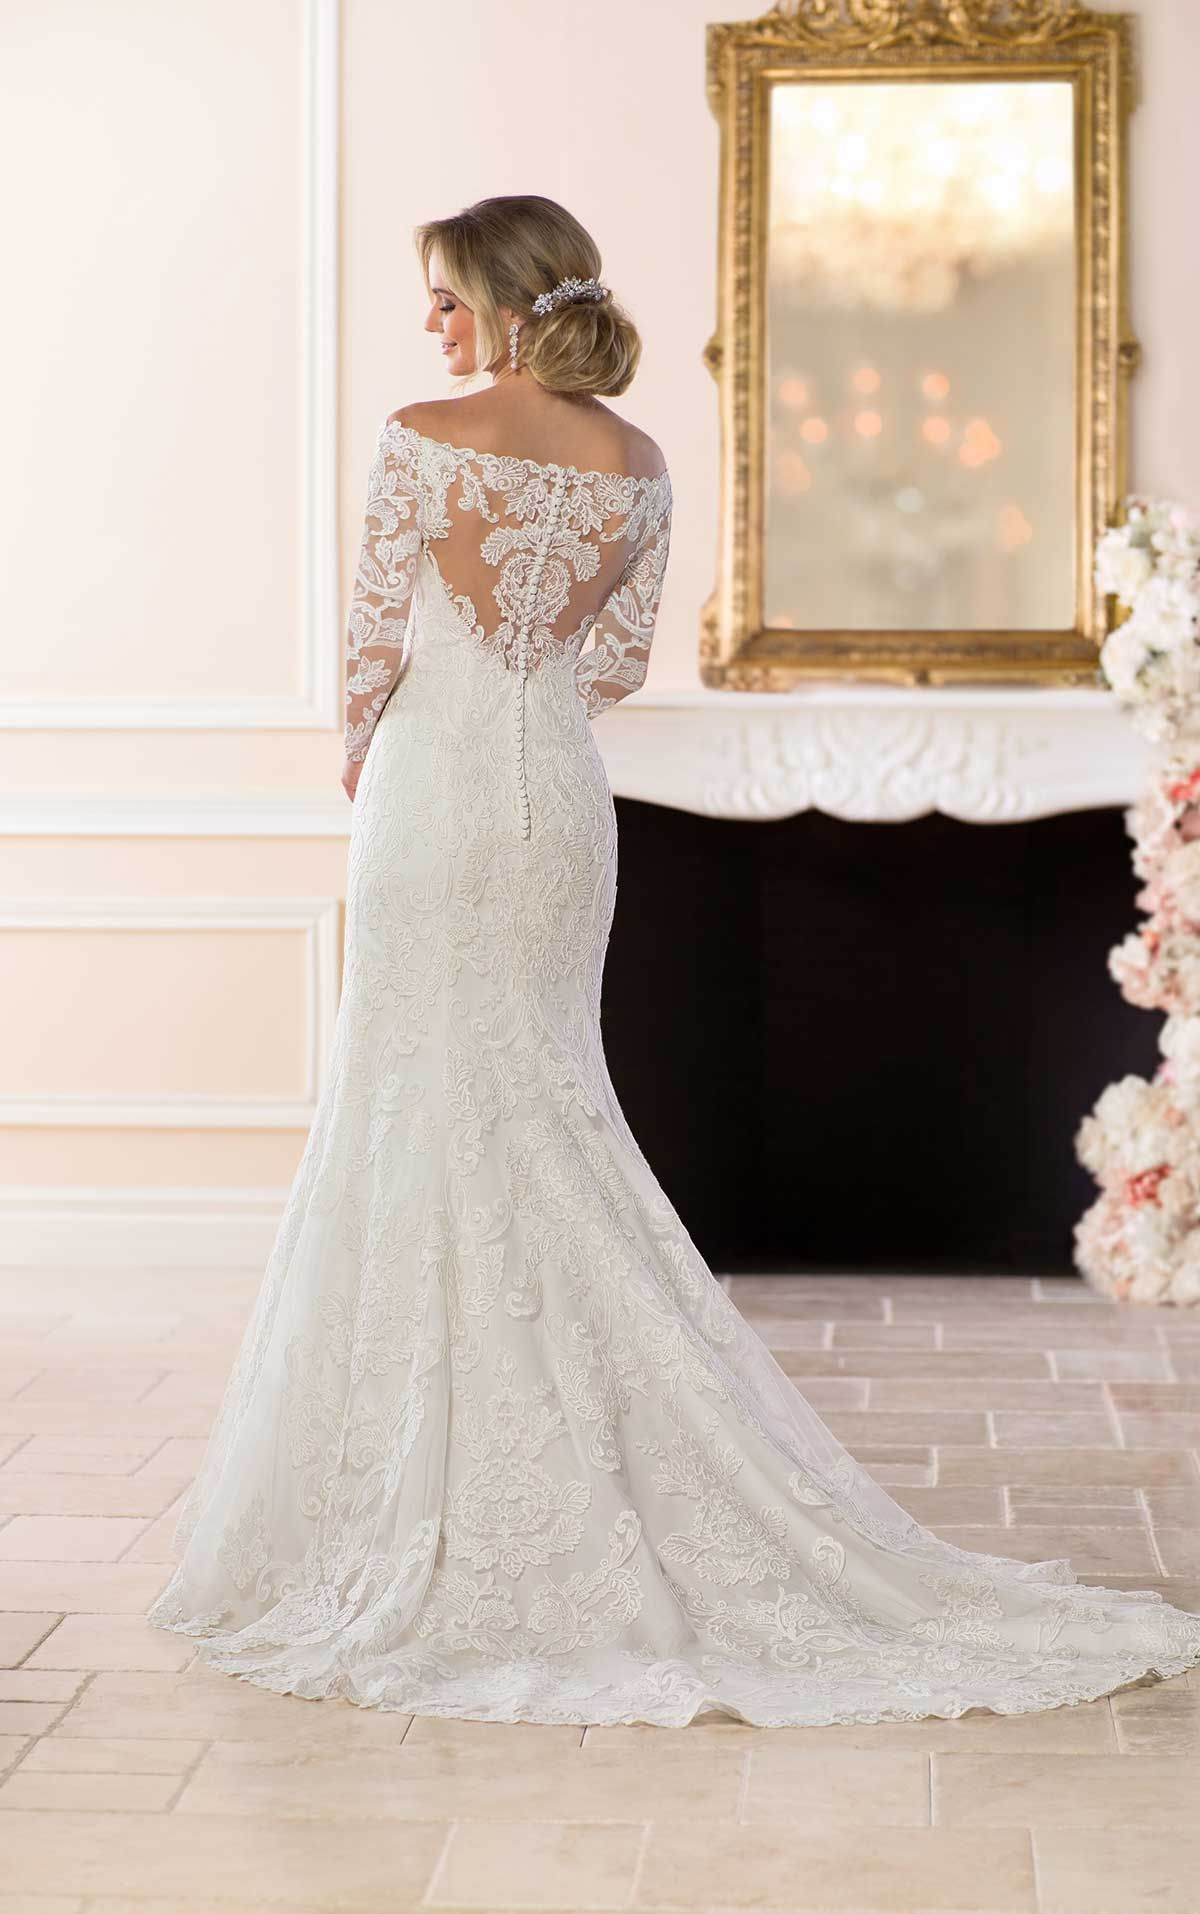 OfftheShoulder Lace Wedding Dress Wedding dress styles